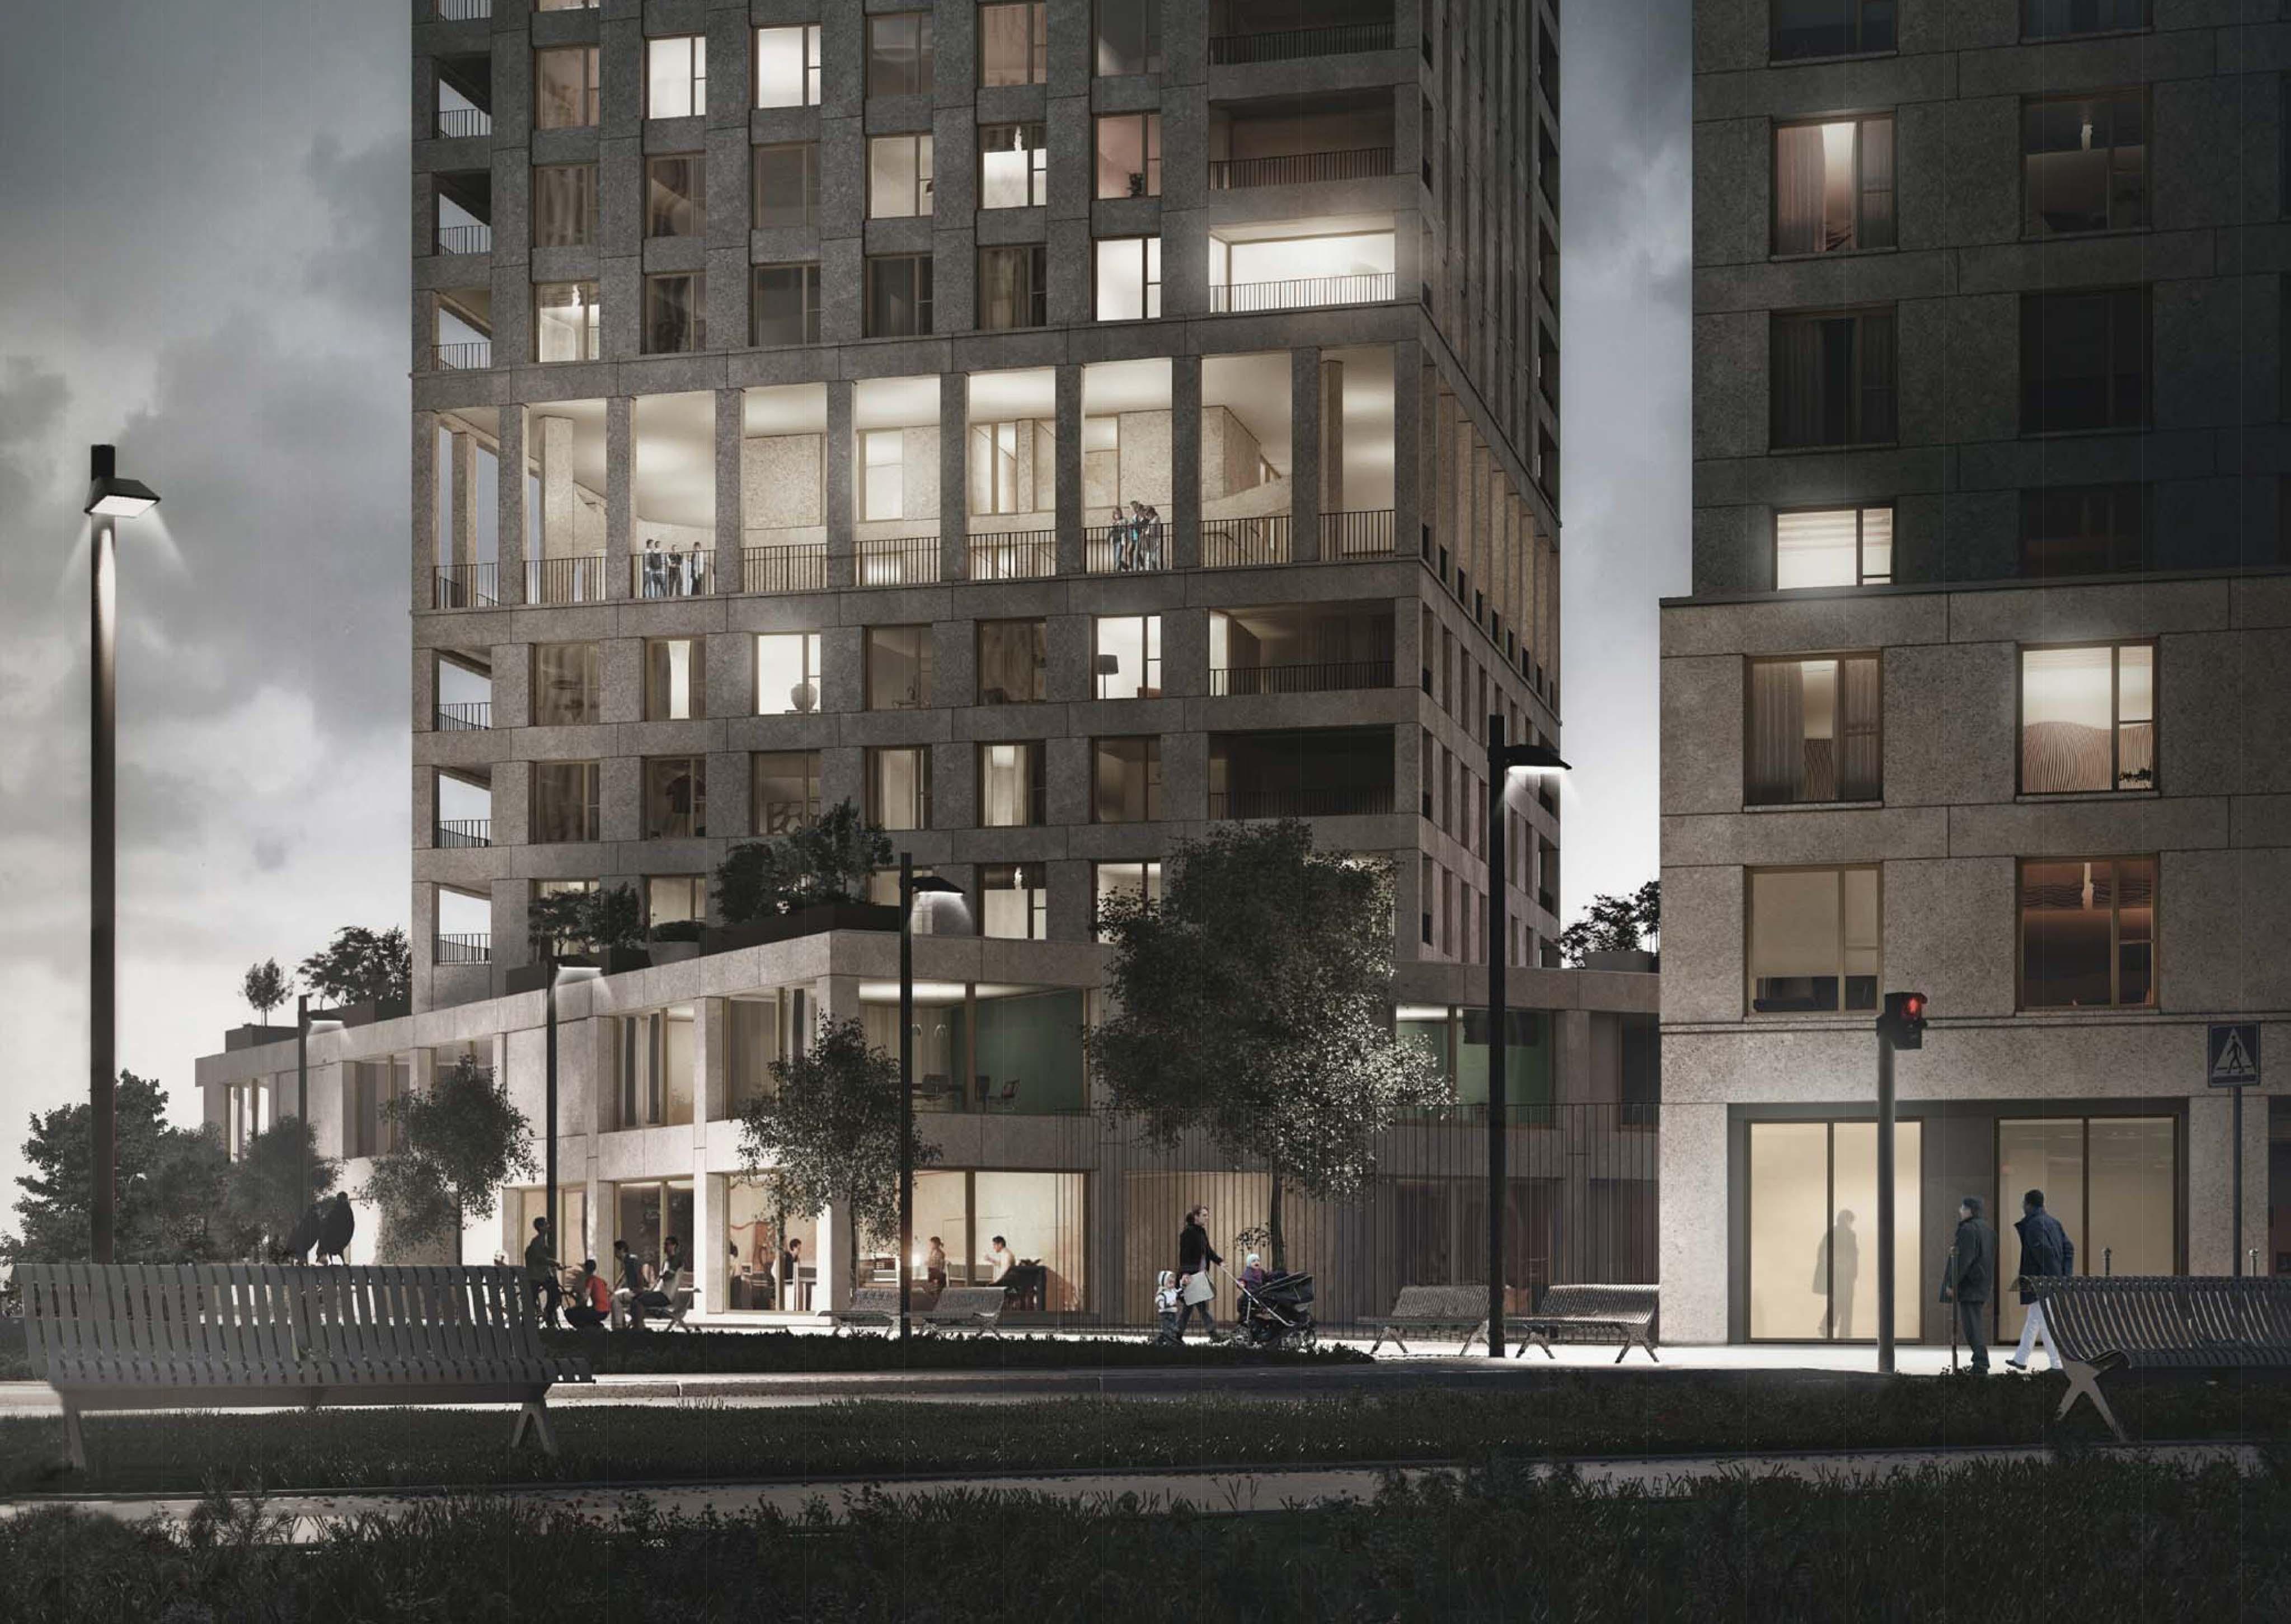 265 logements et soho paris chapelle international atelier martel. Black Bedroom Furniture Sets. Home Design Ideas